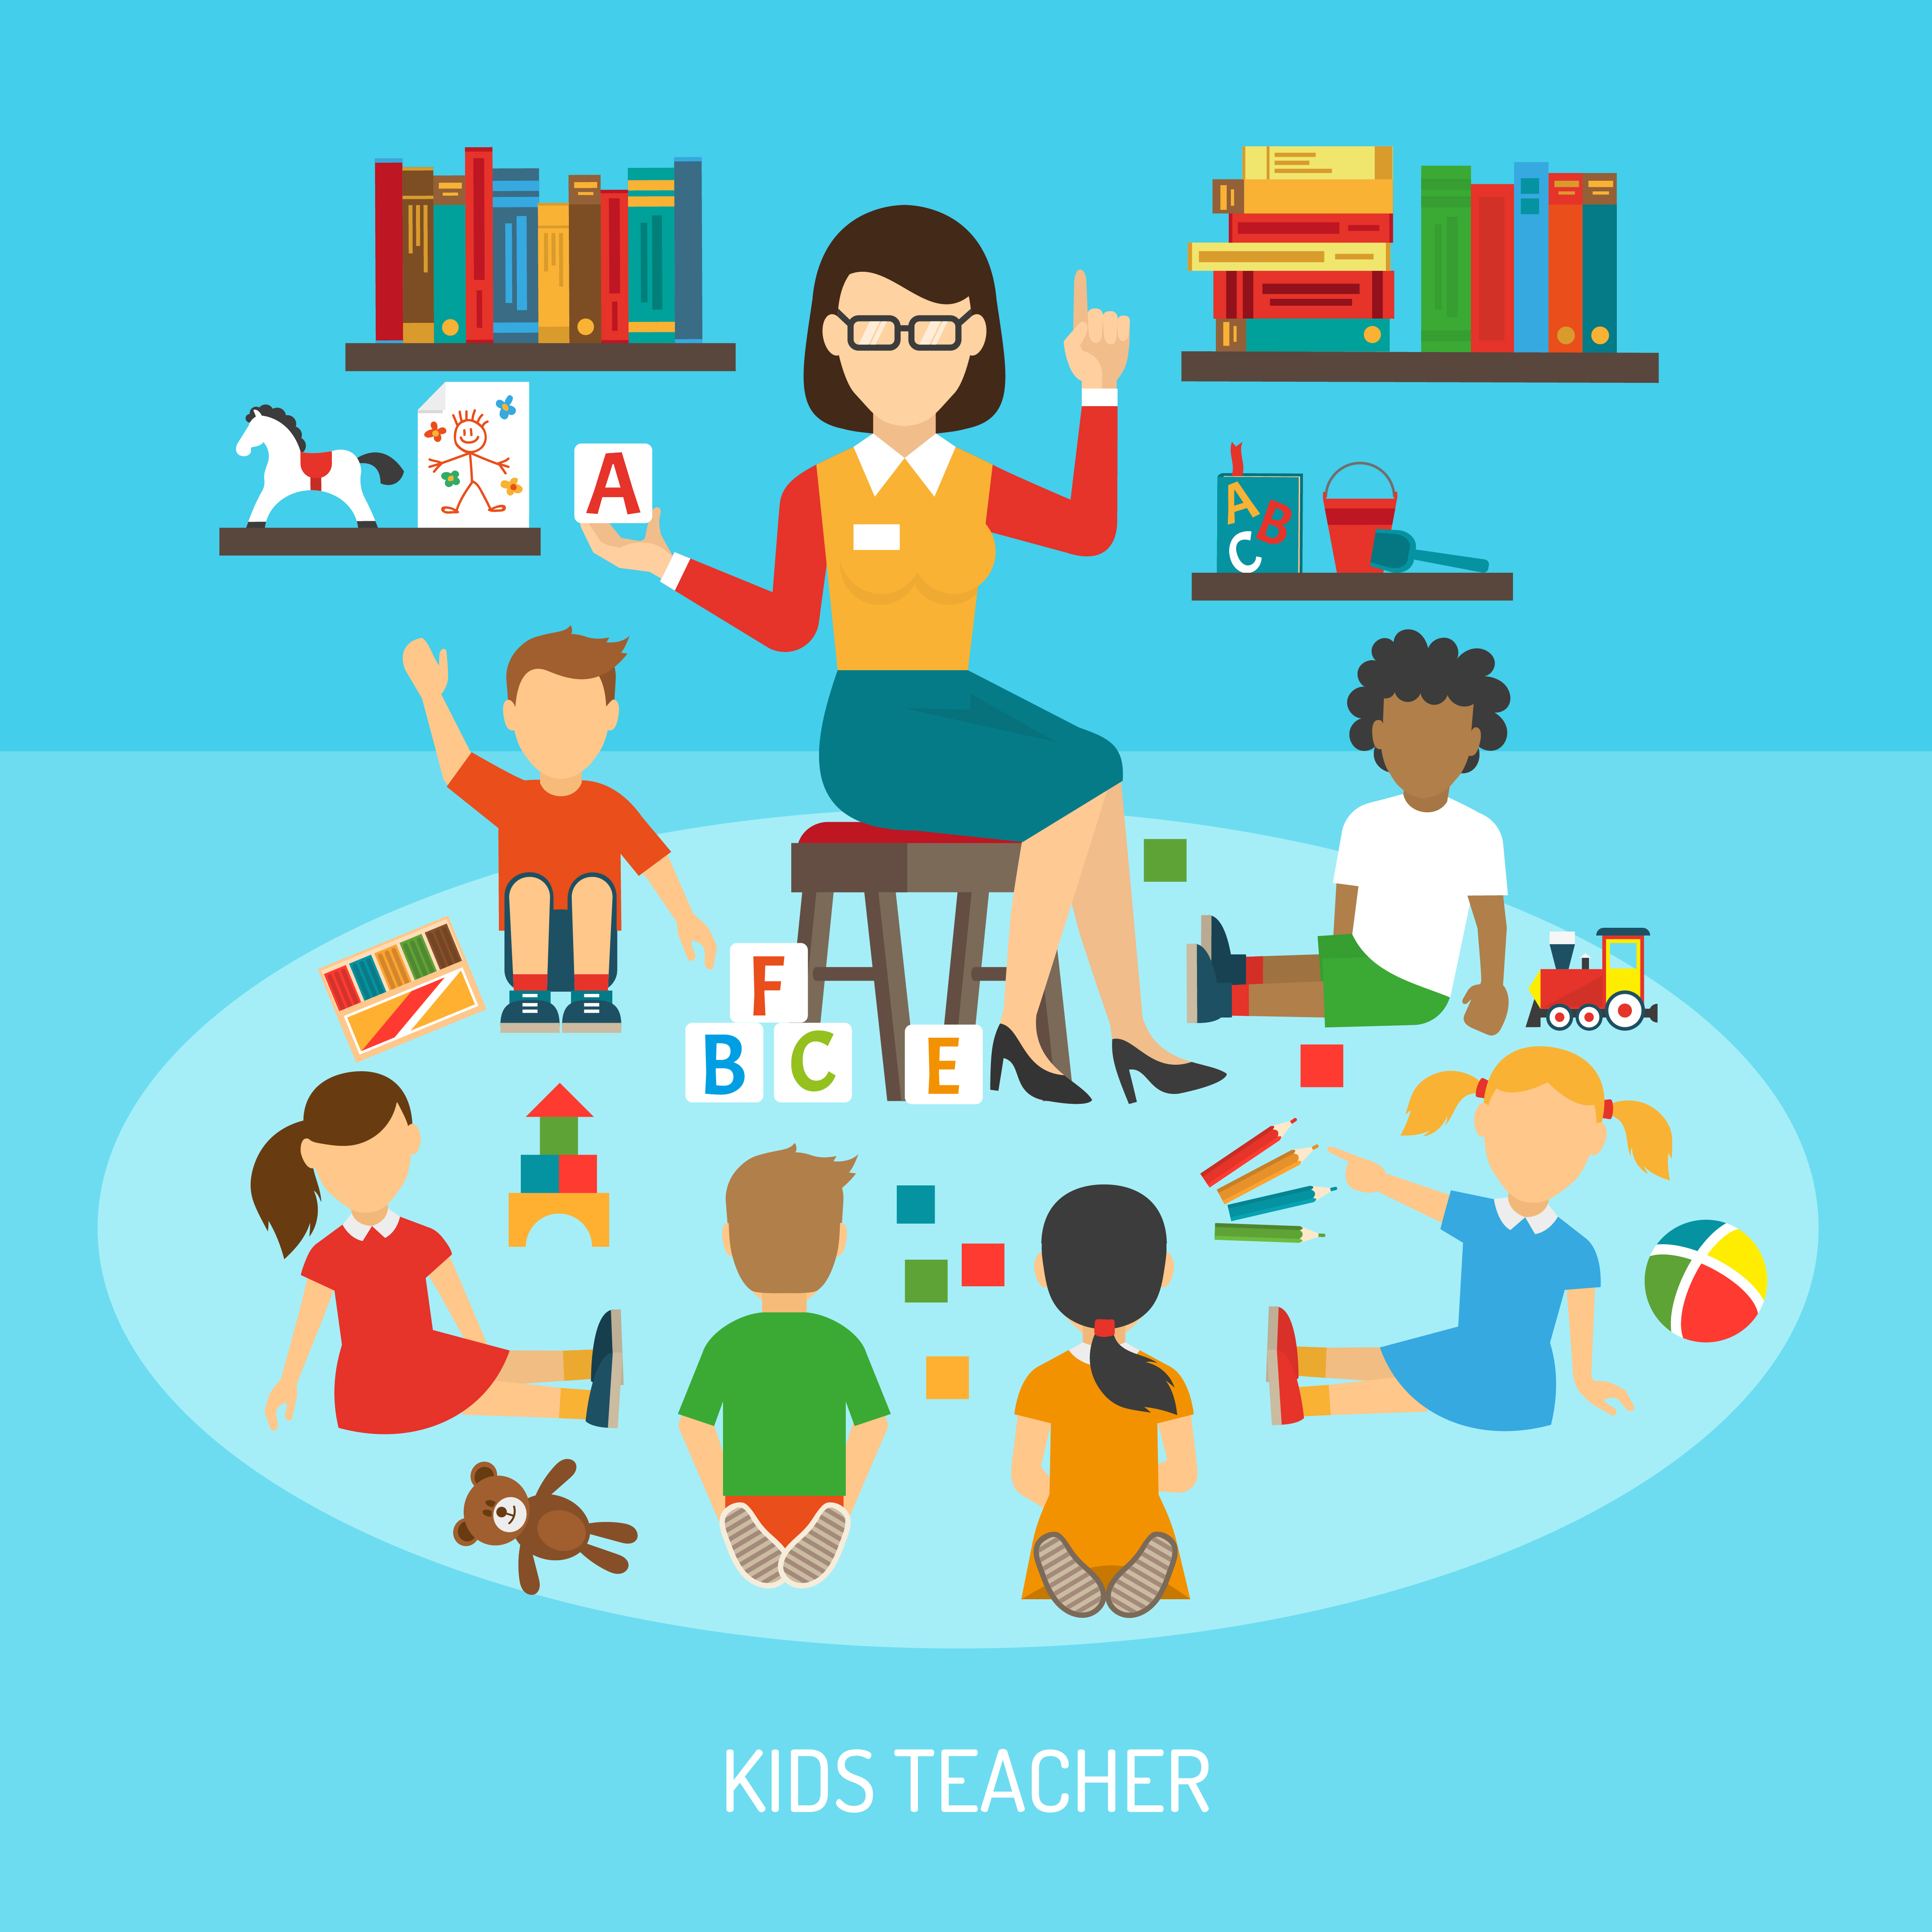 Kids teacher poster download free vector art stock graphics images - Children s day images download ...